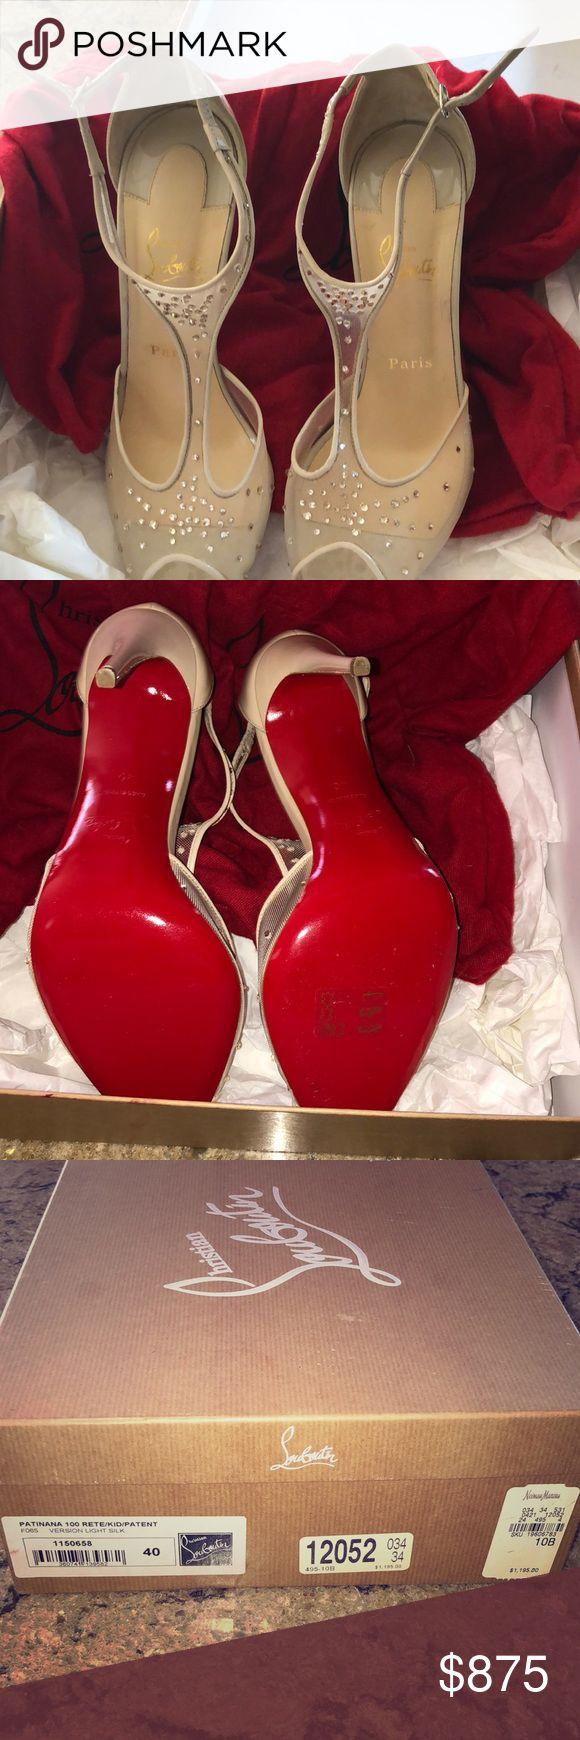 Patiana 100 leichte Seide Christian Louboutin Schuhe Nude mit Kristallen. Zweimal warnen …